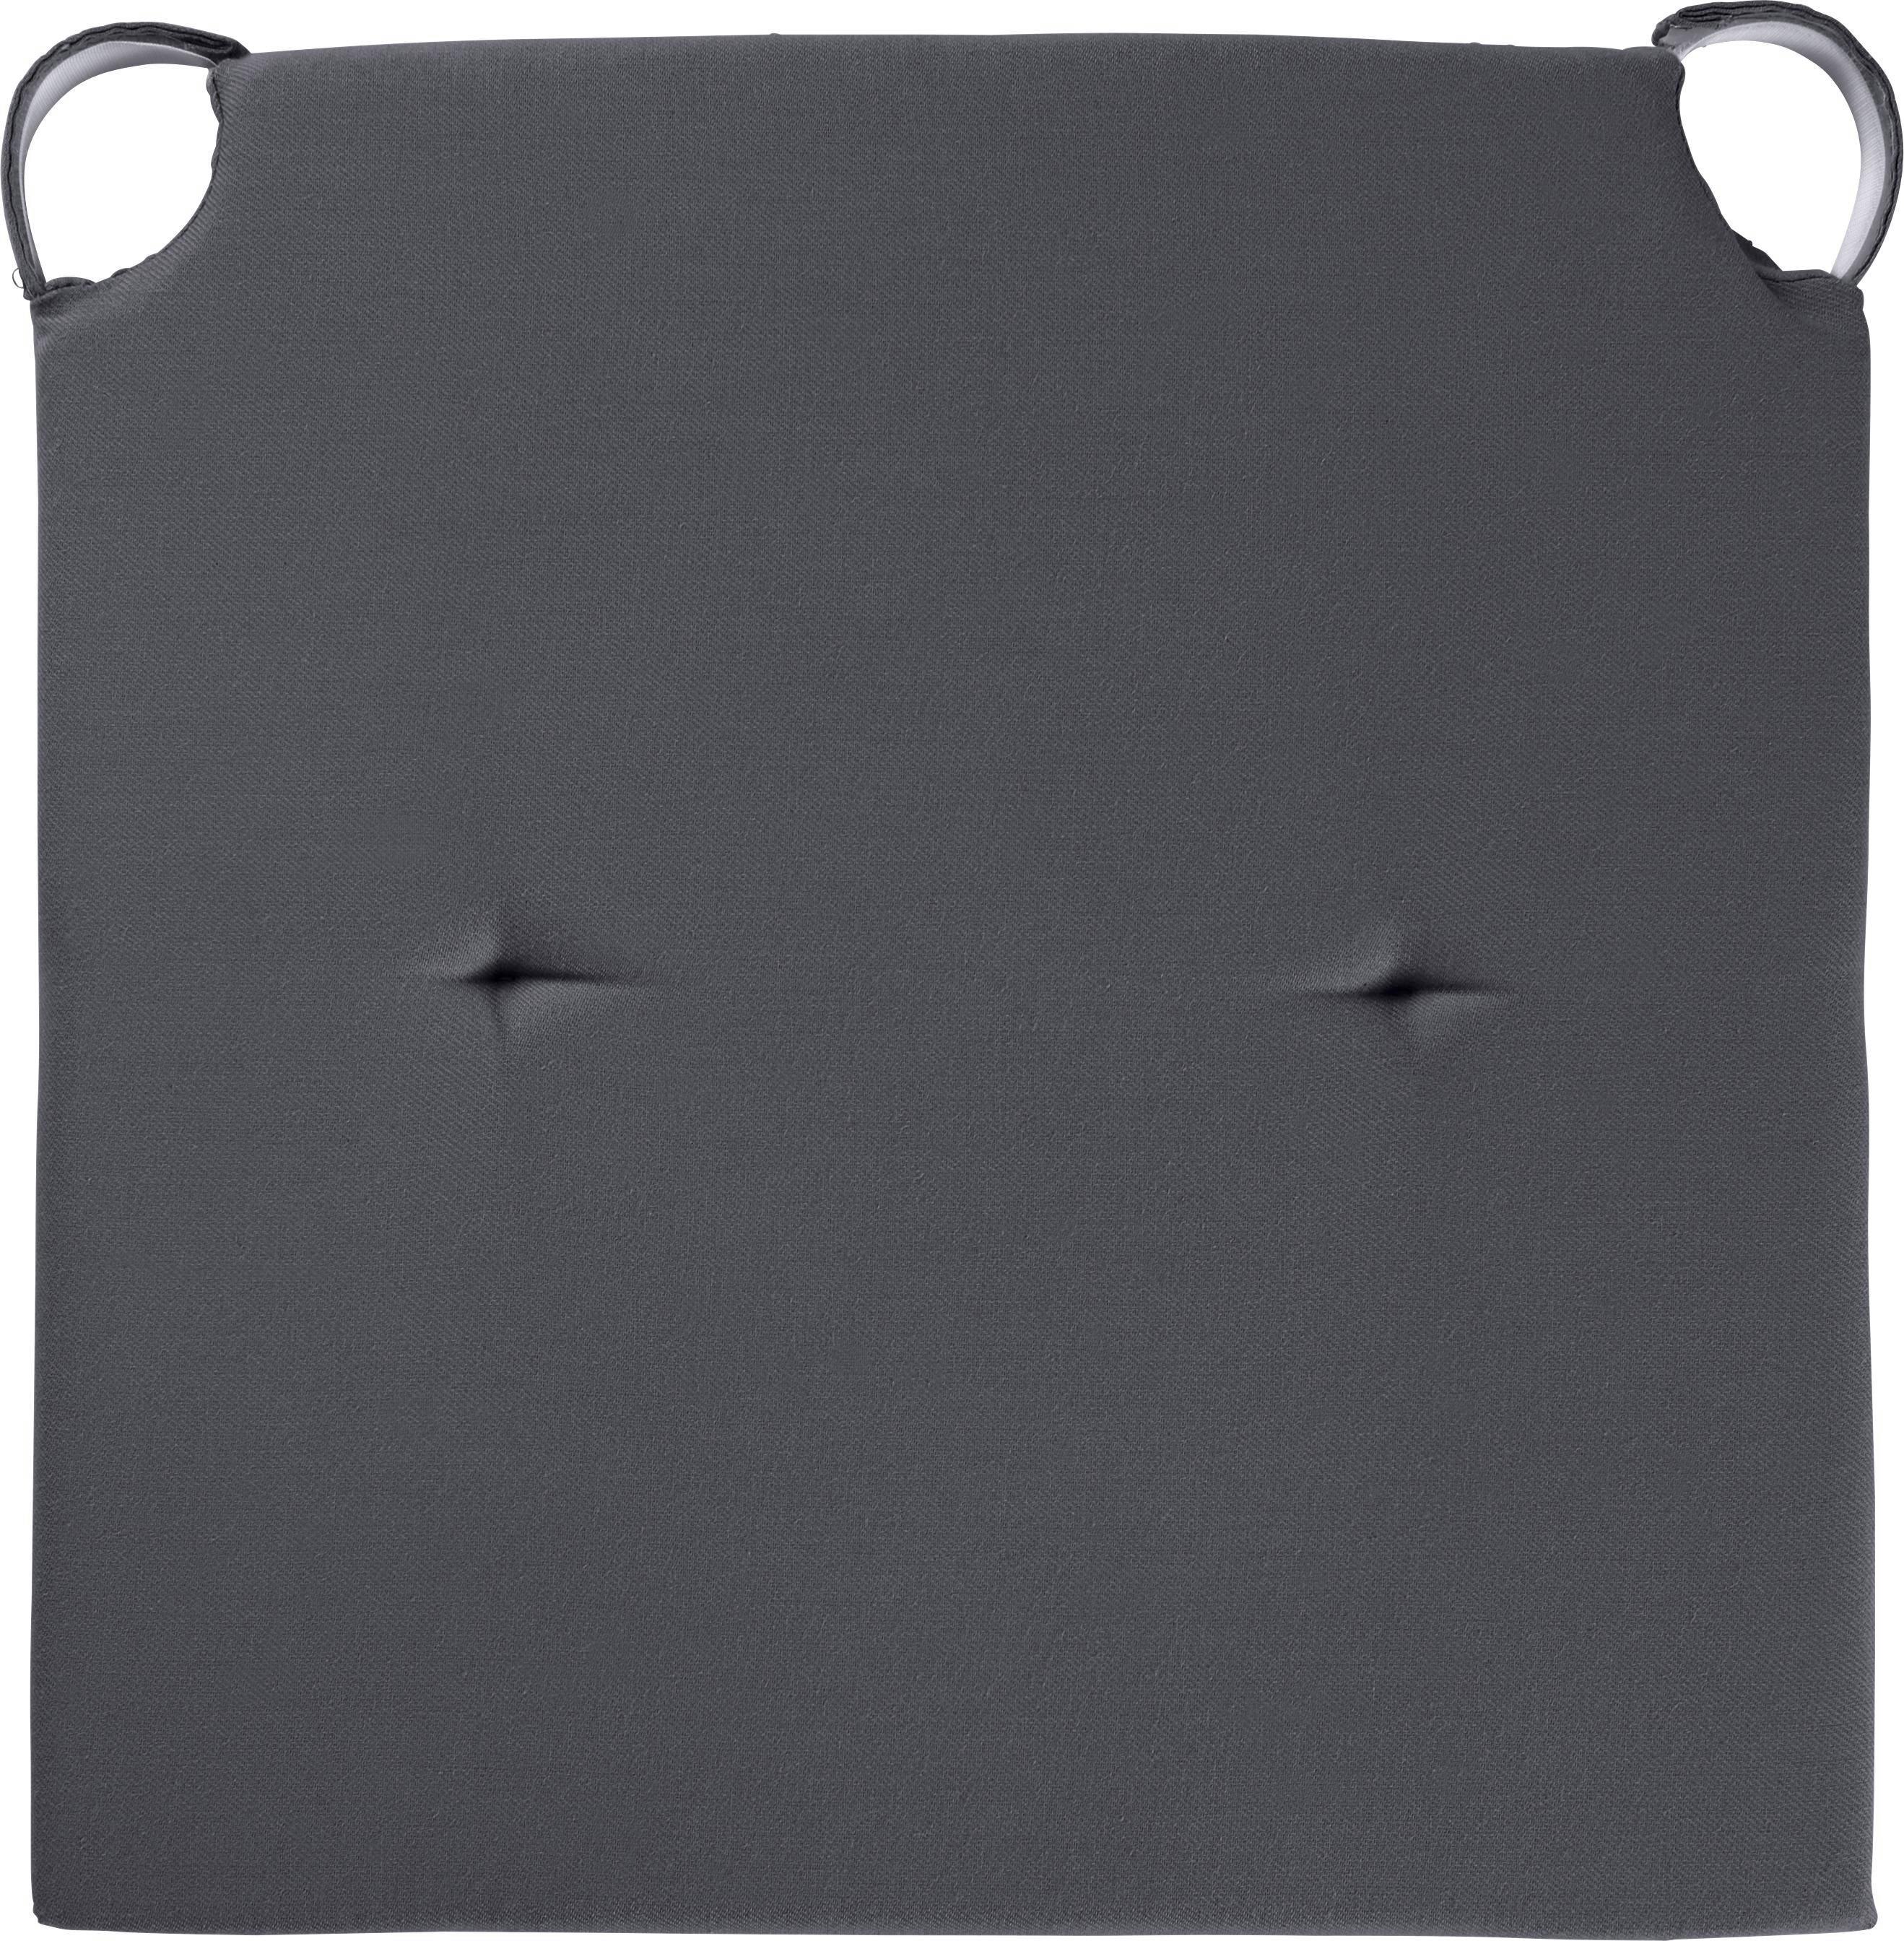 Sitzkissen Lilli 40x40cm - Dunkelgrau, KONVENTIONELL, Textil (40/40/3cm) - MÖMAX modern living